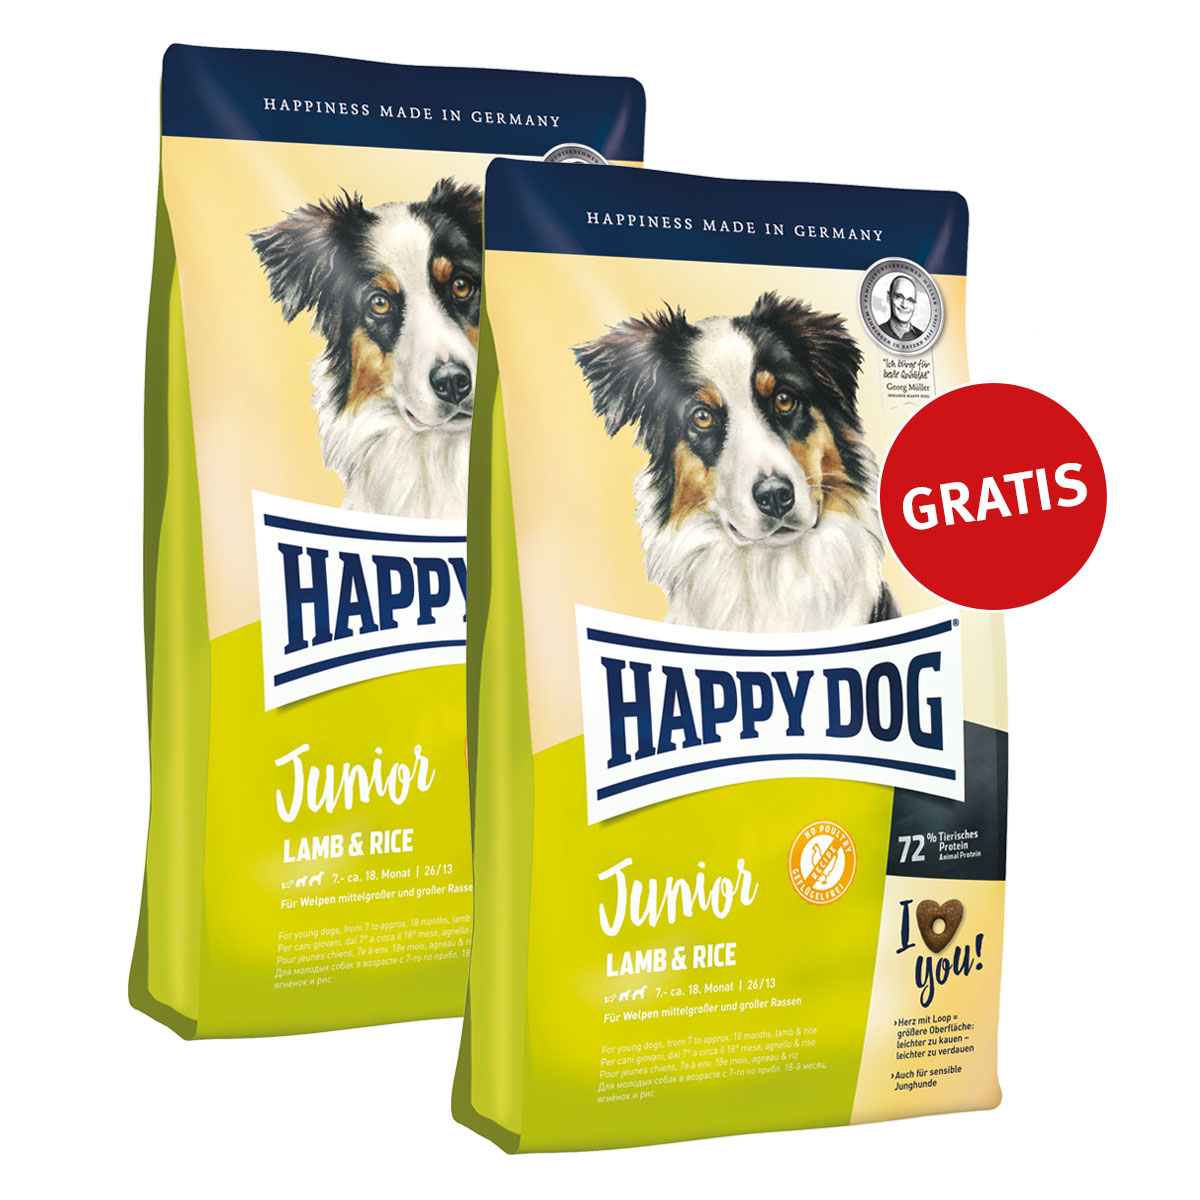 zooroyal 1 kg happy dog supreme young trockenfutter kaufen und 1 kg gratis dazu erhalten je. Black Bedroom Furniture Sets. Home Design Ideas